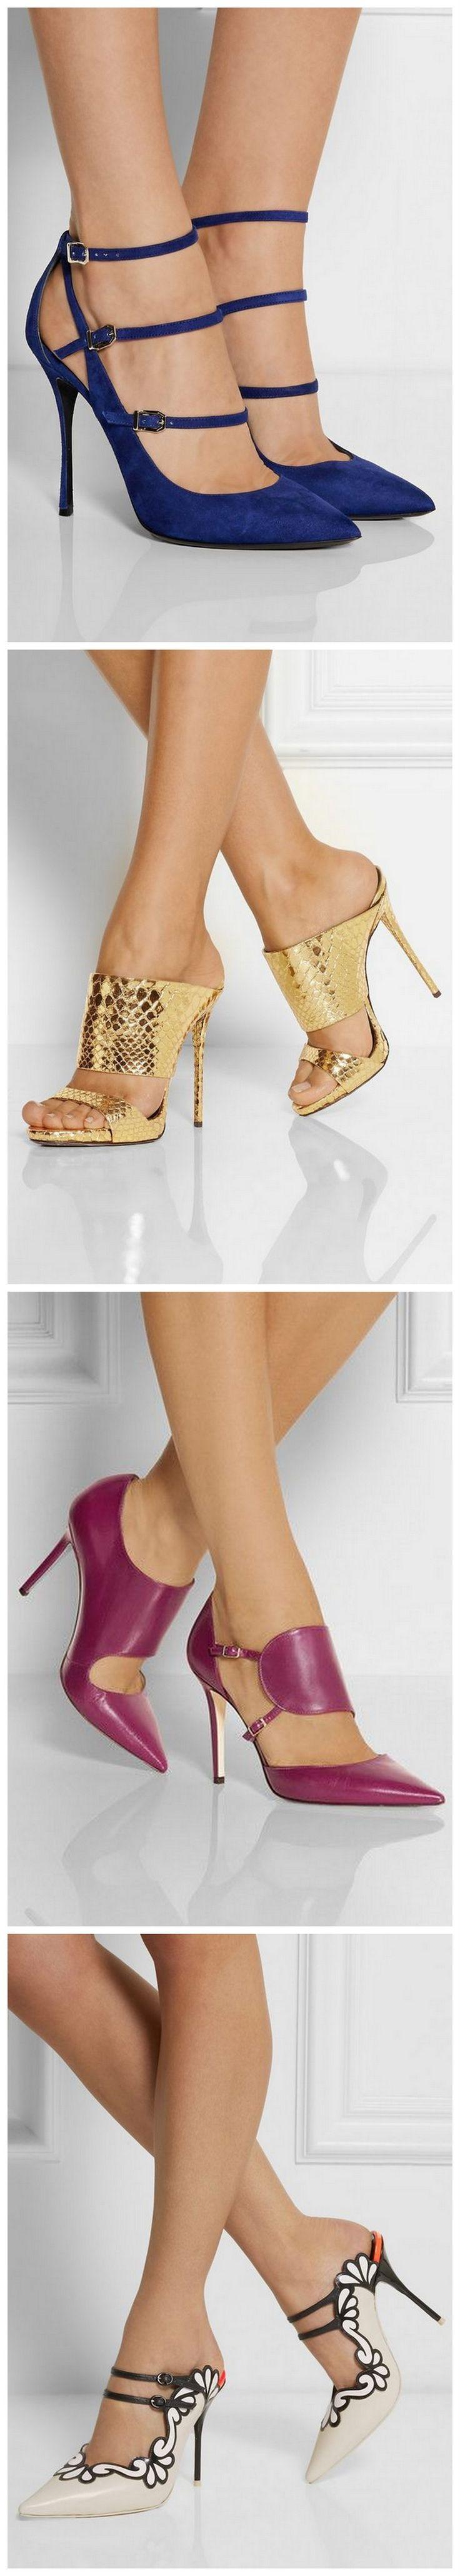 101 Stunning high heels and pumps ||. Ledyz Fashions. - www.ledyzfashions.com